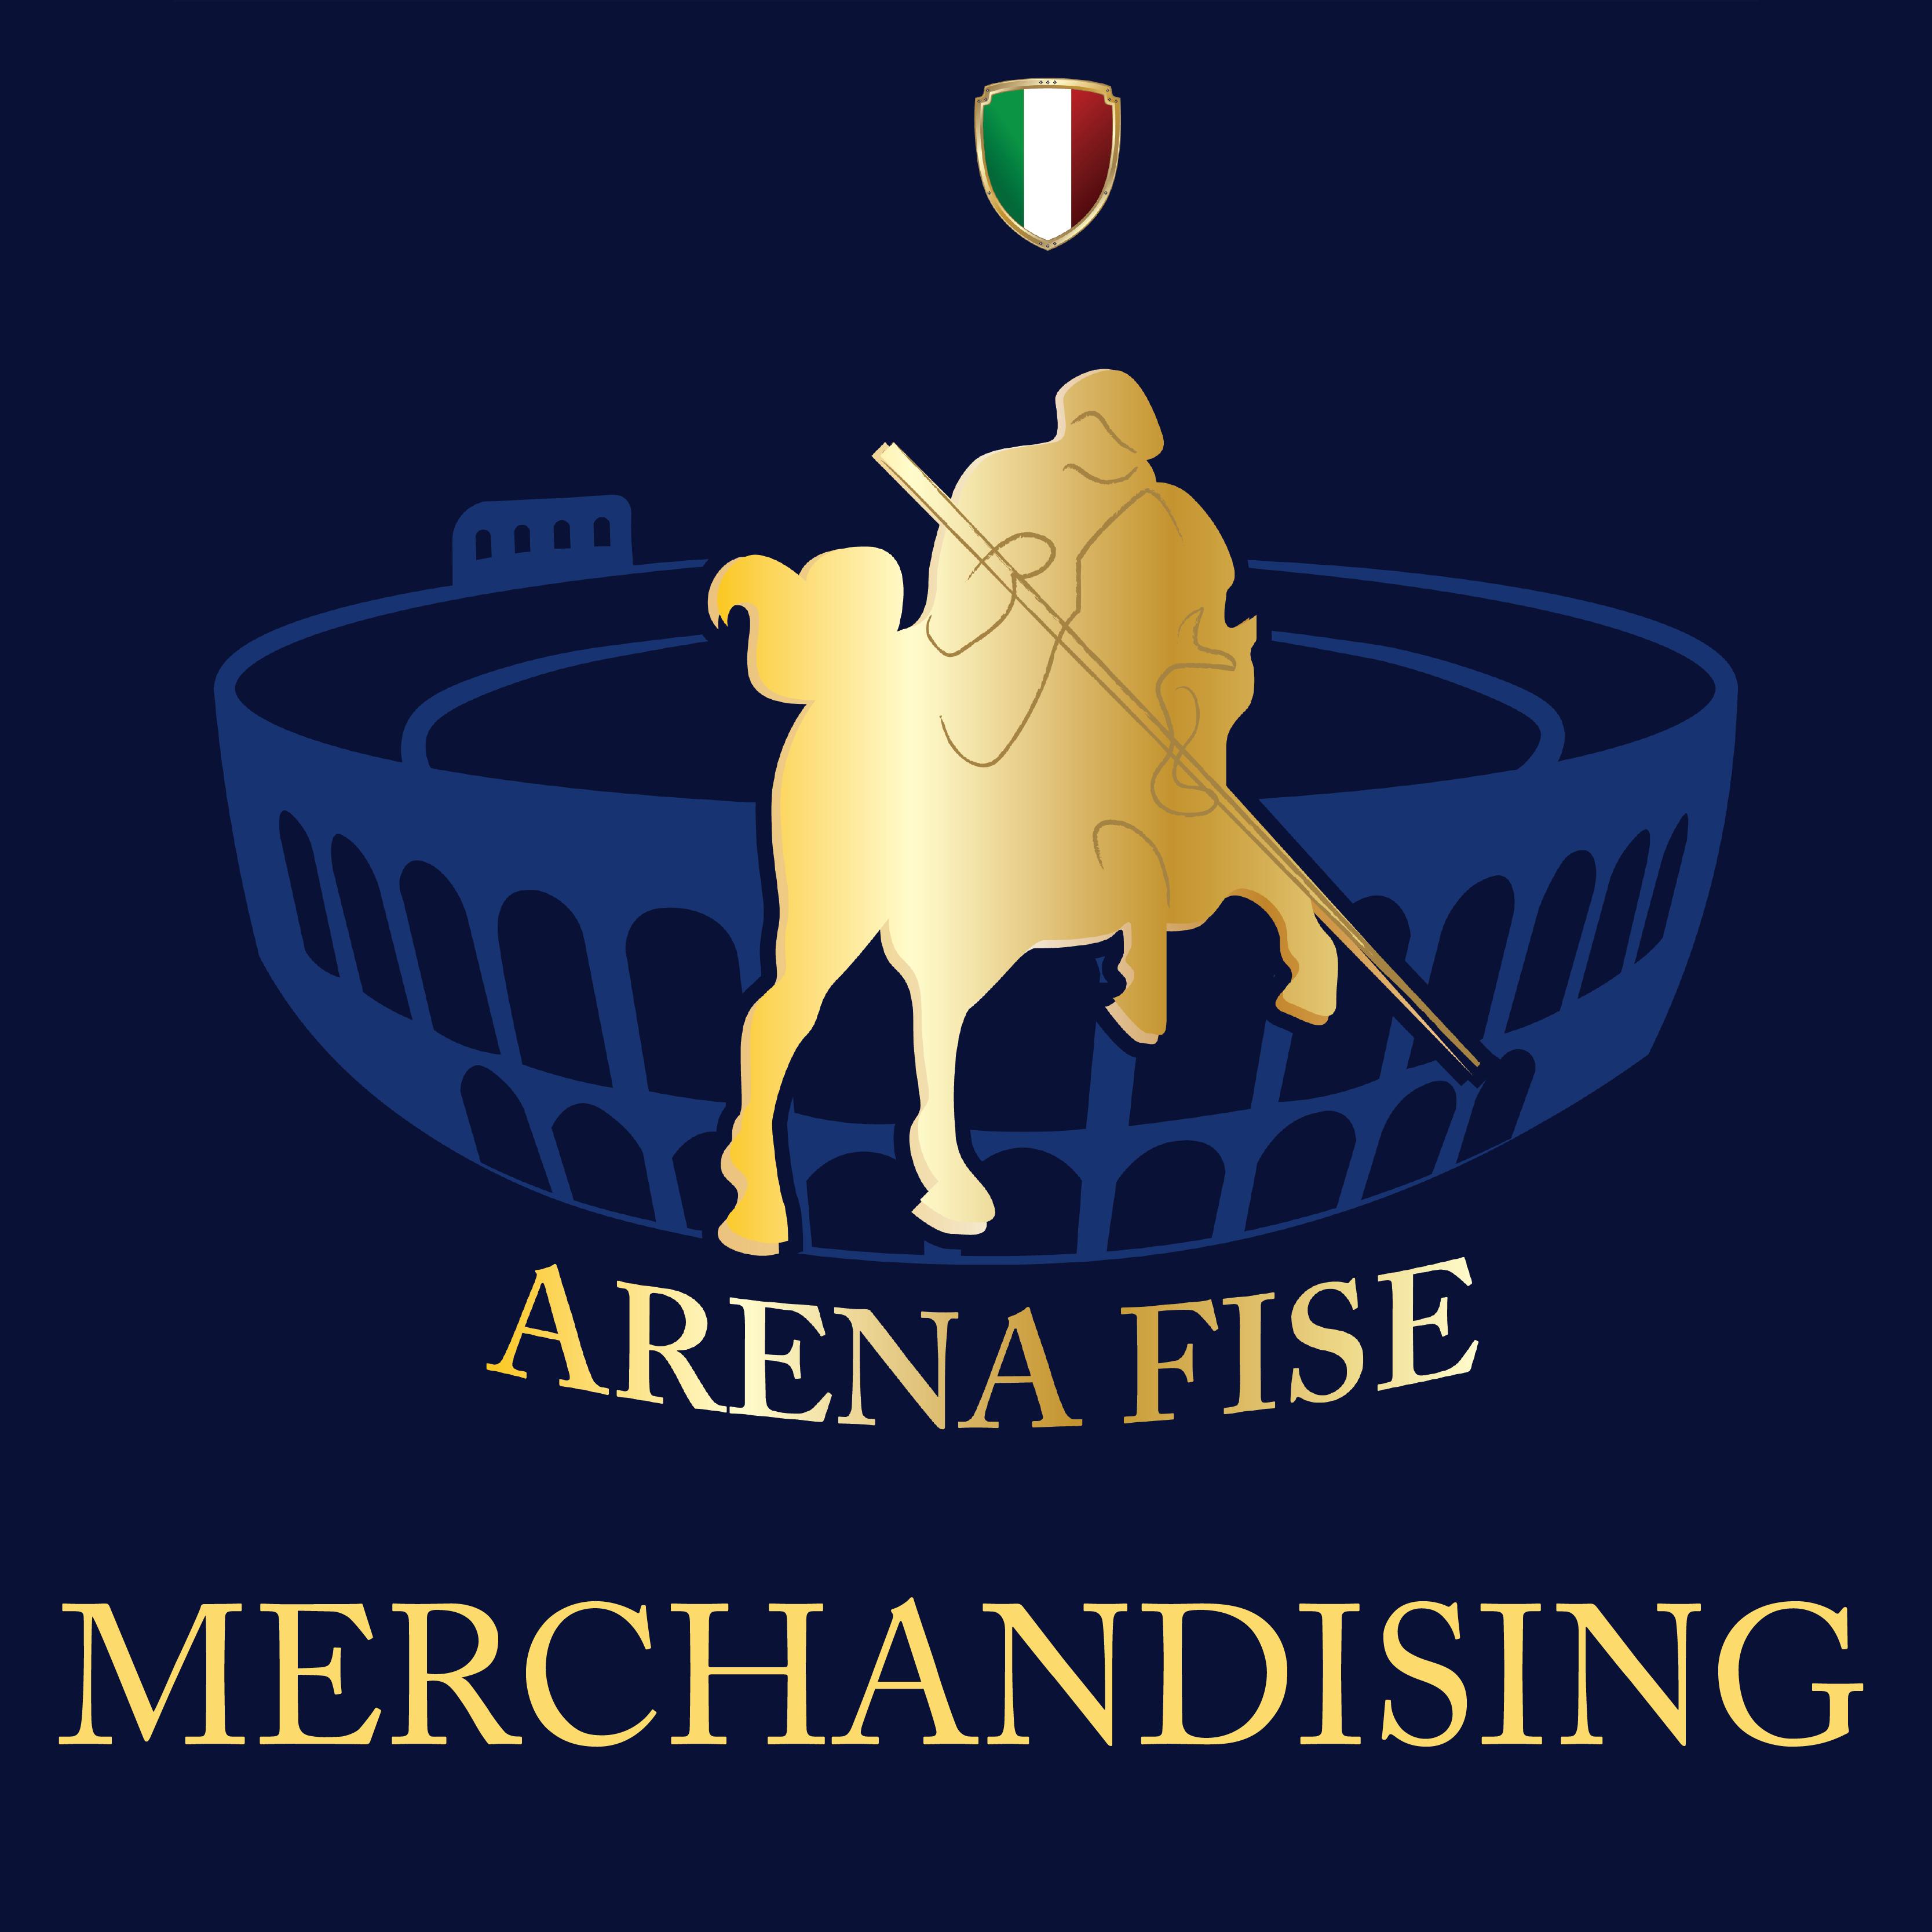 Federazione Italiana Sport Equestri Arena Fise 2020